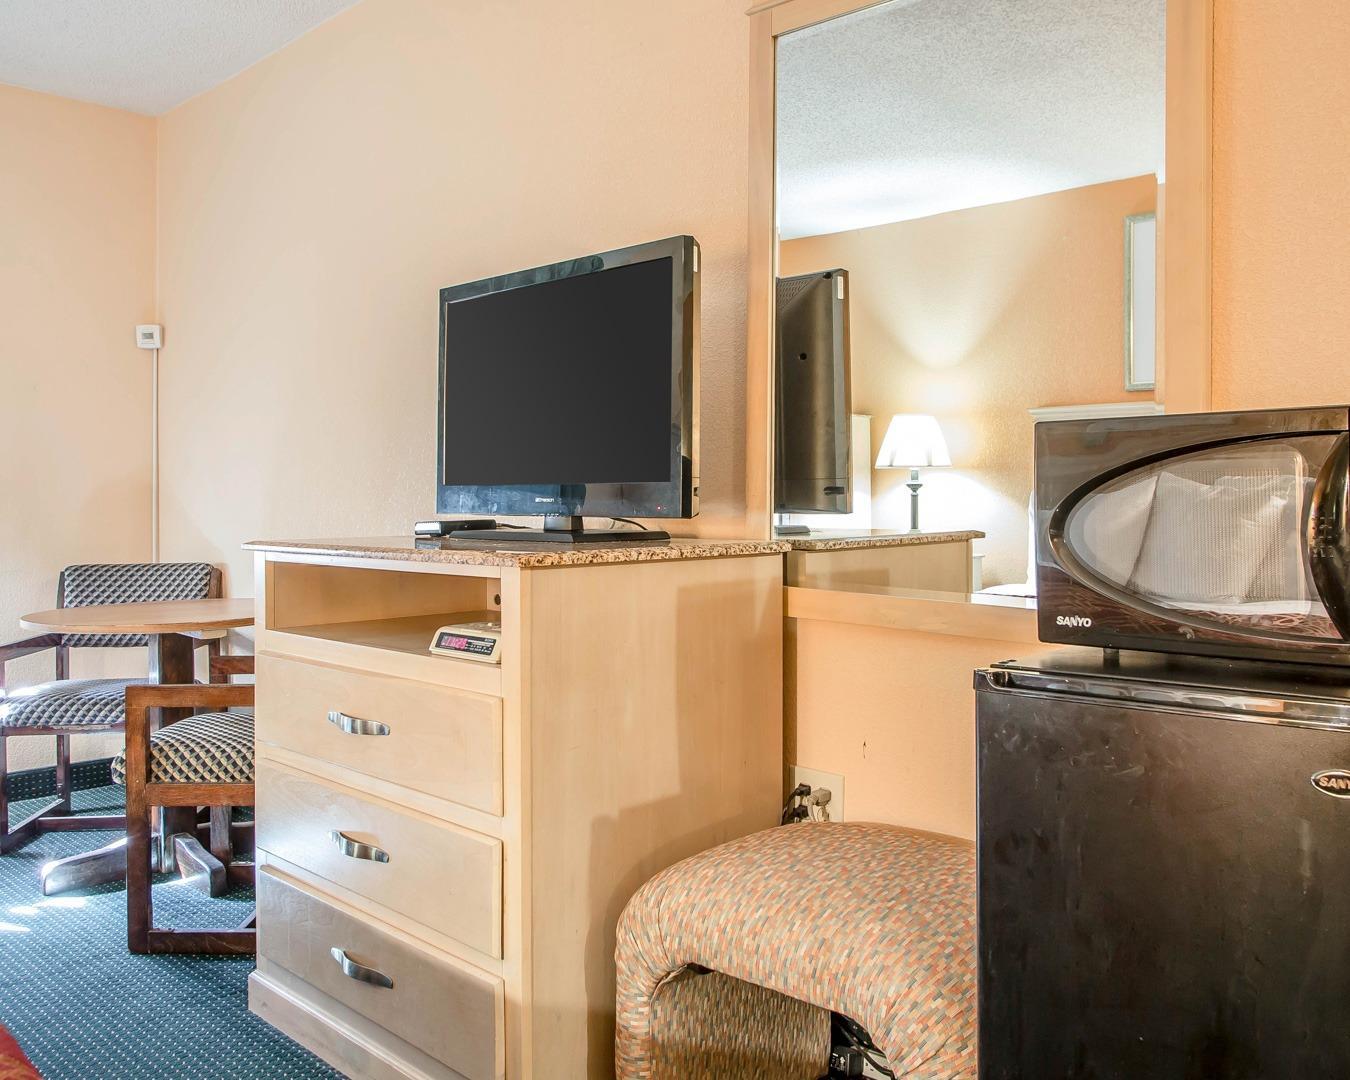 Rodeway Inn & Suites, Buena NJ